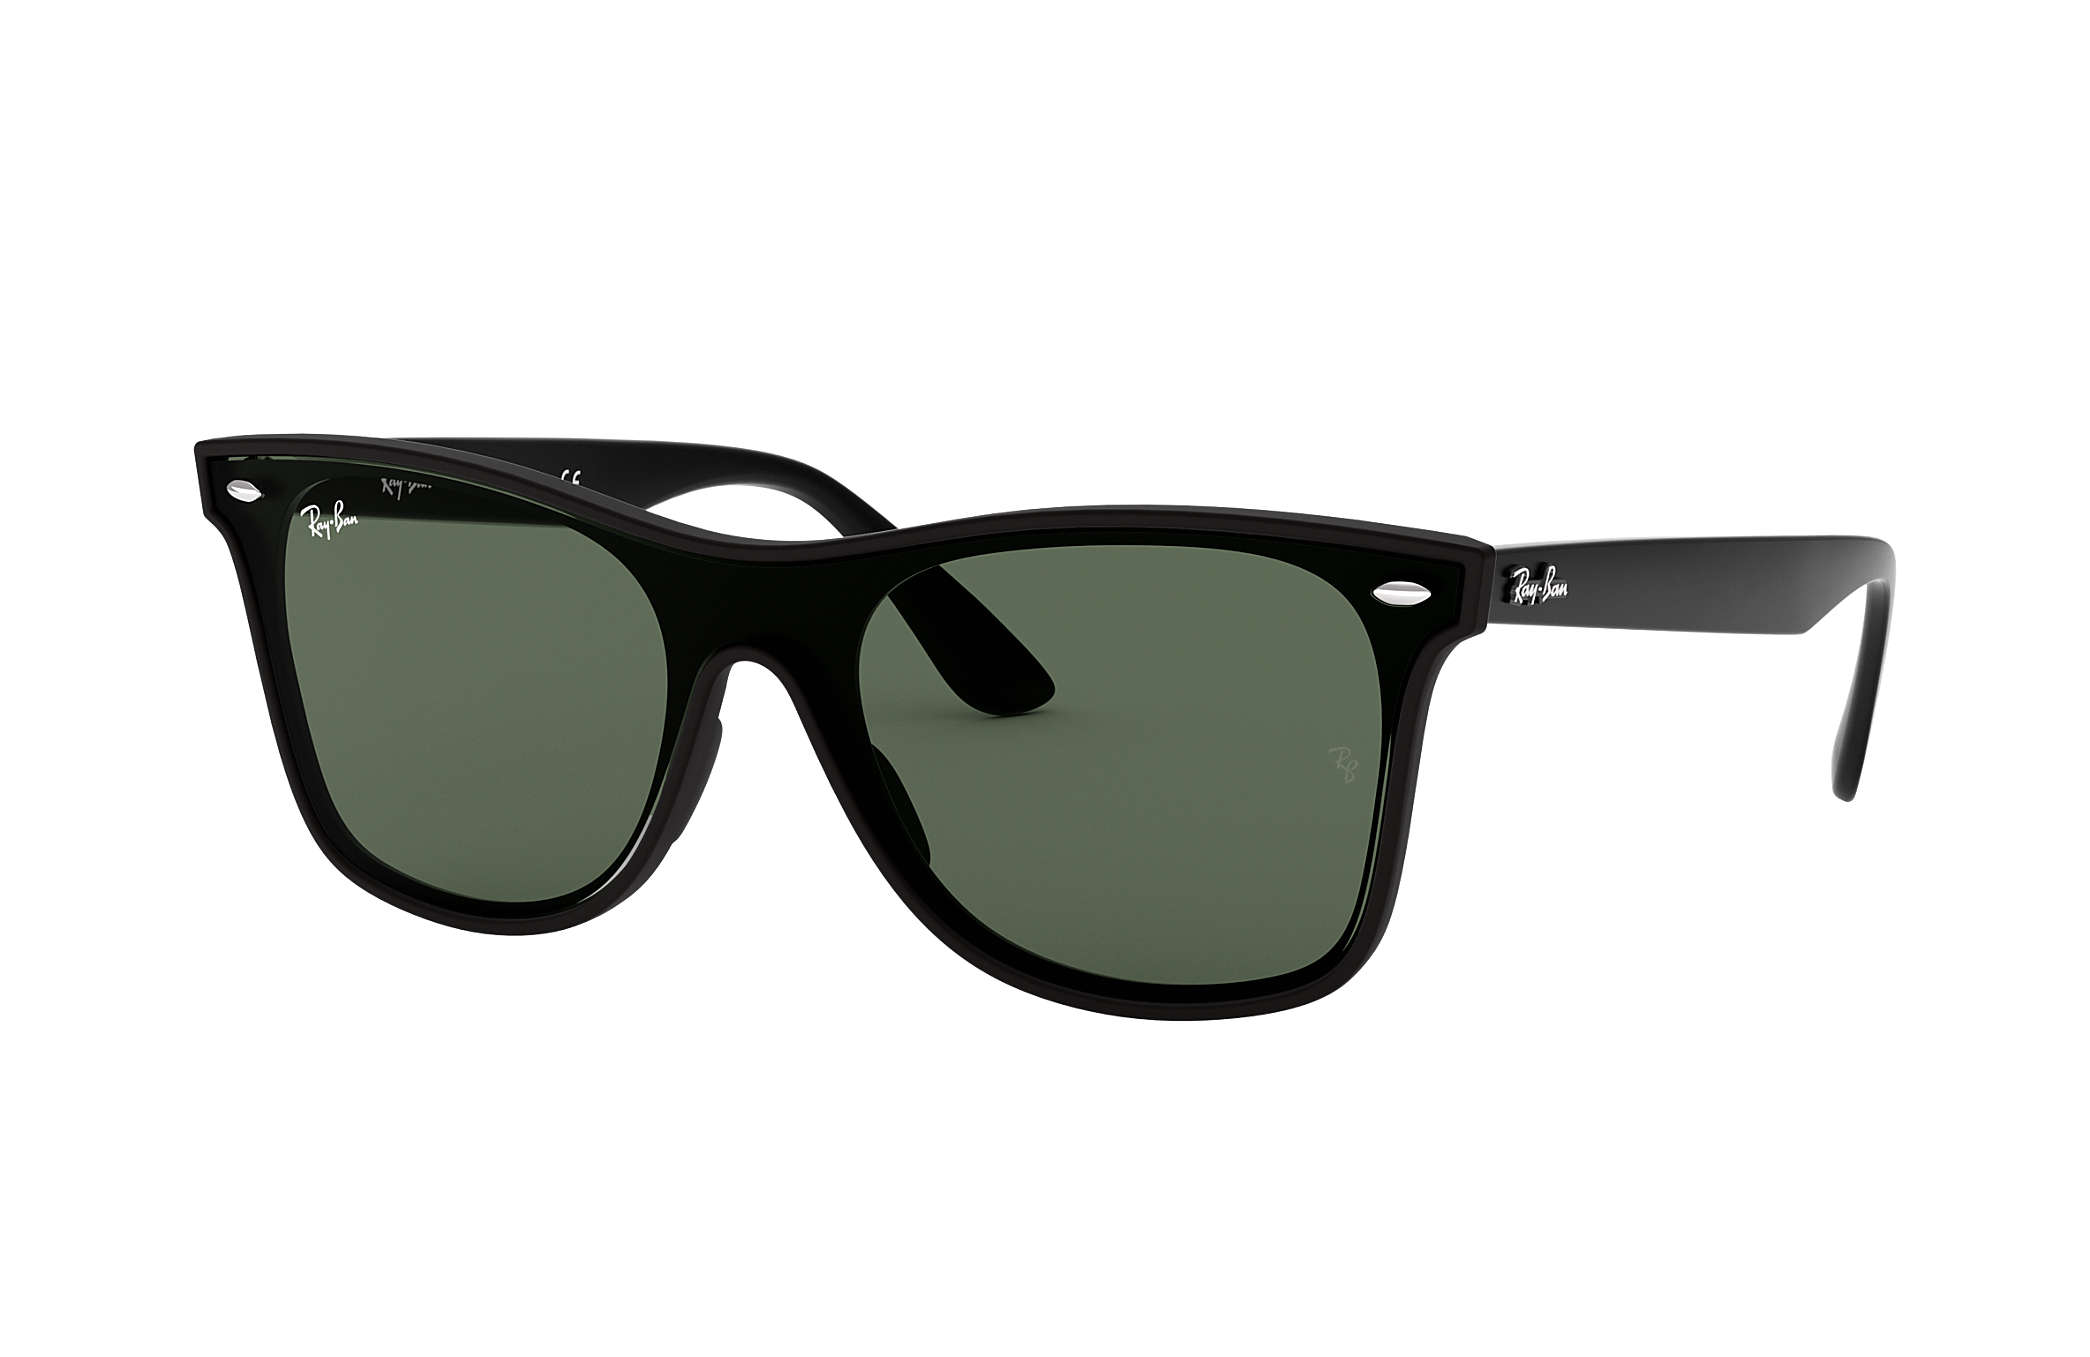 68a2ef27370 Ray-Ban Blaze Wayfarer RB4440N Black - Nylon - Green Lenses ...